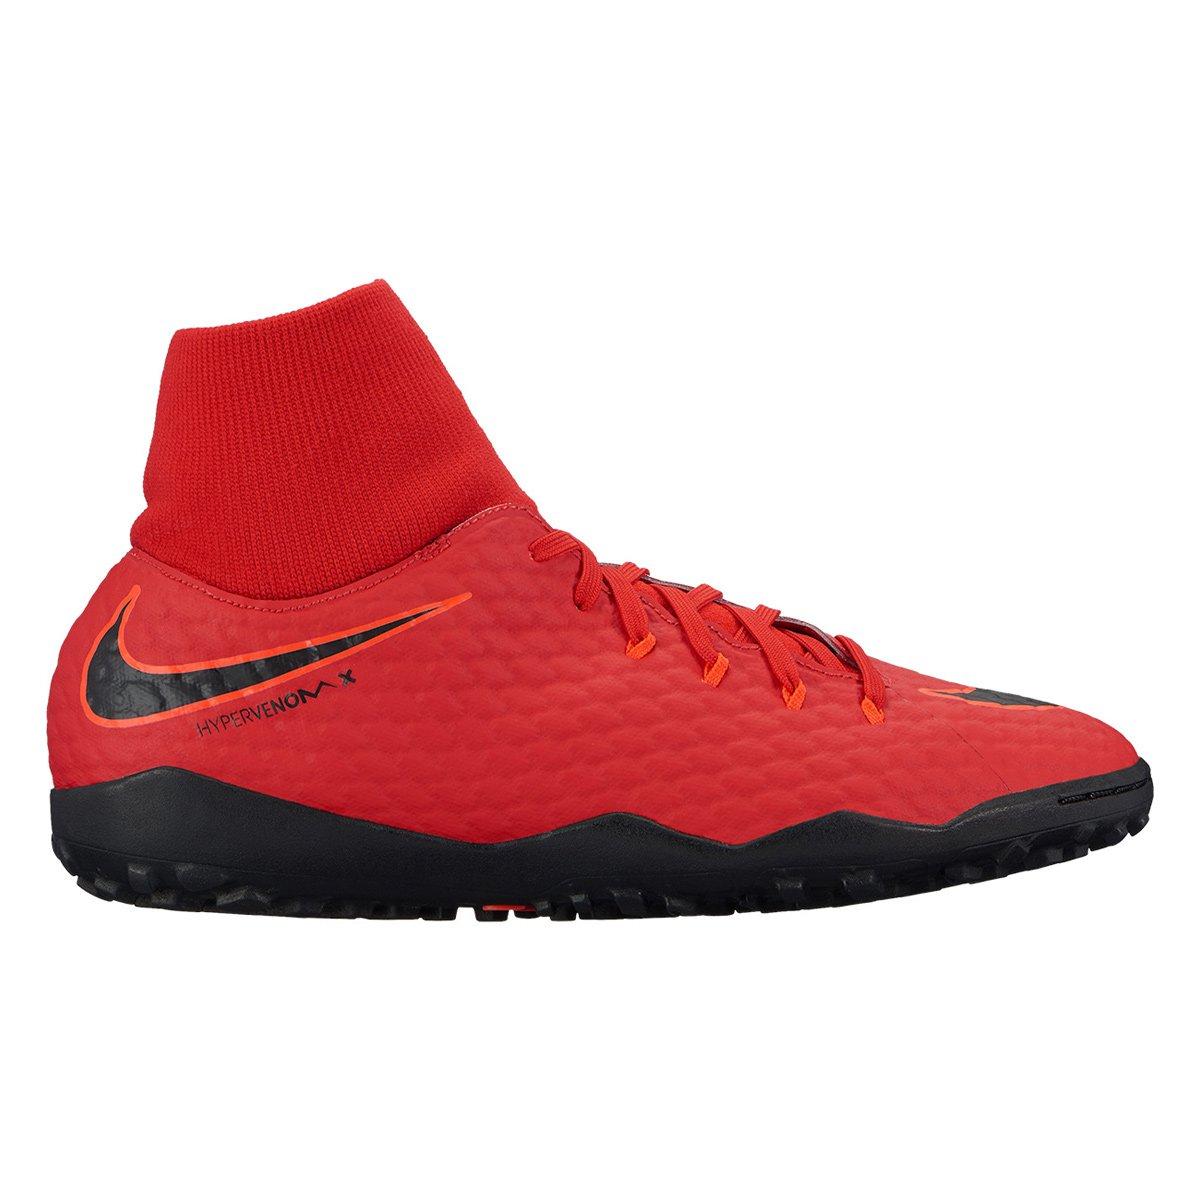 new concept d9aa6 80867 Chuteira Society Nike Hypervenom Phelon 3 DF TF - Compre Agora   Netshoes